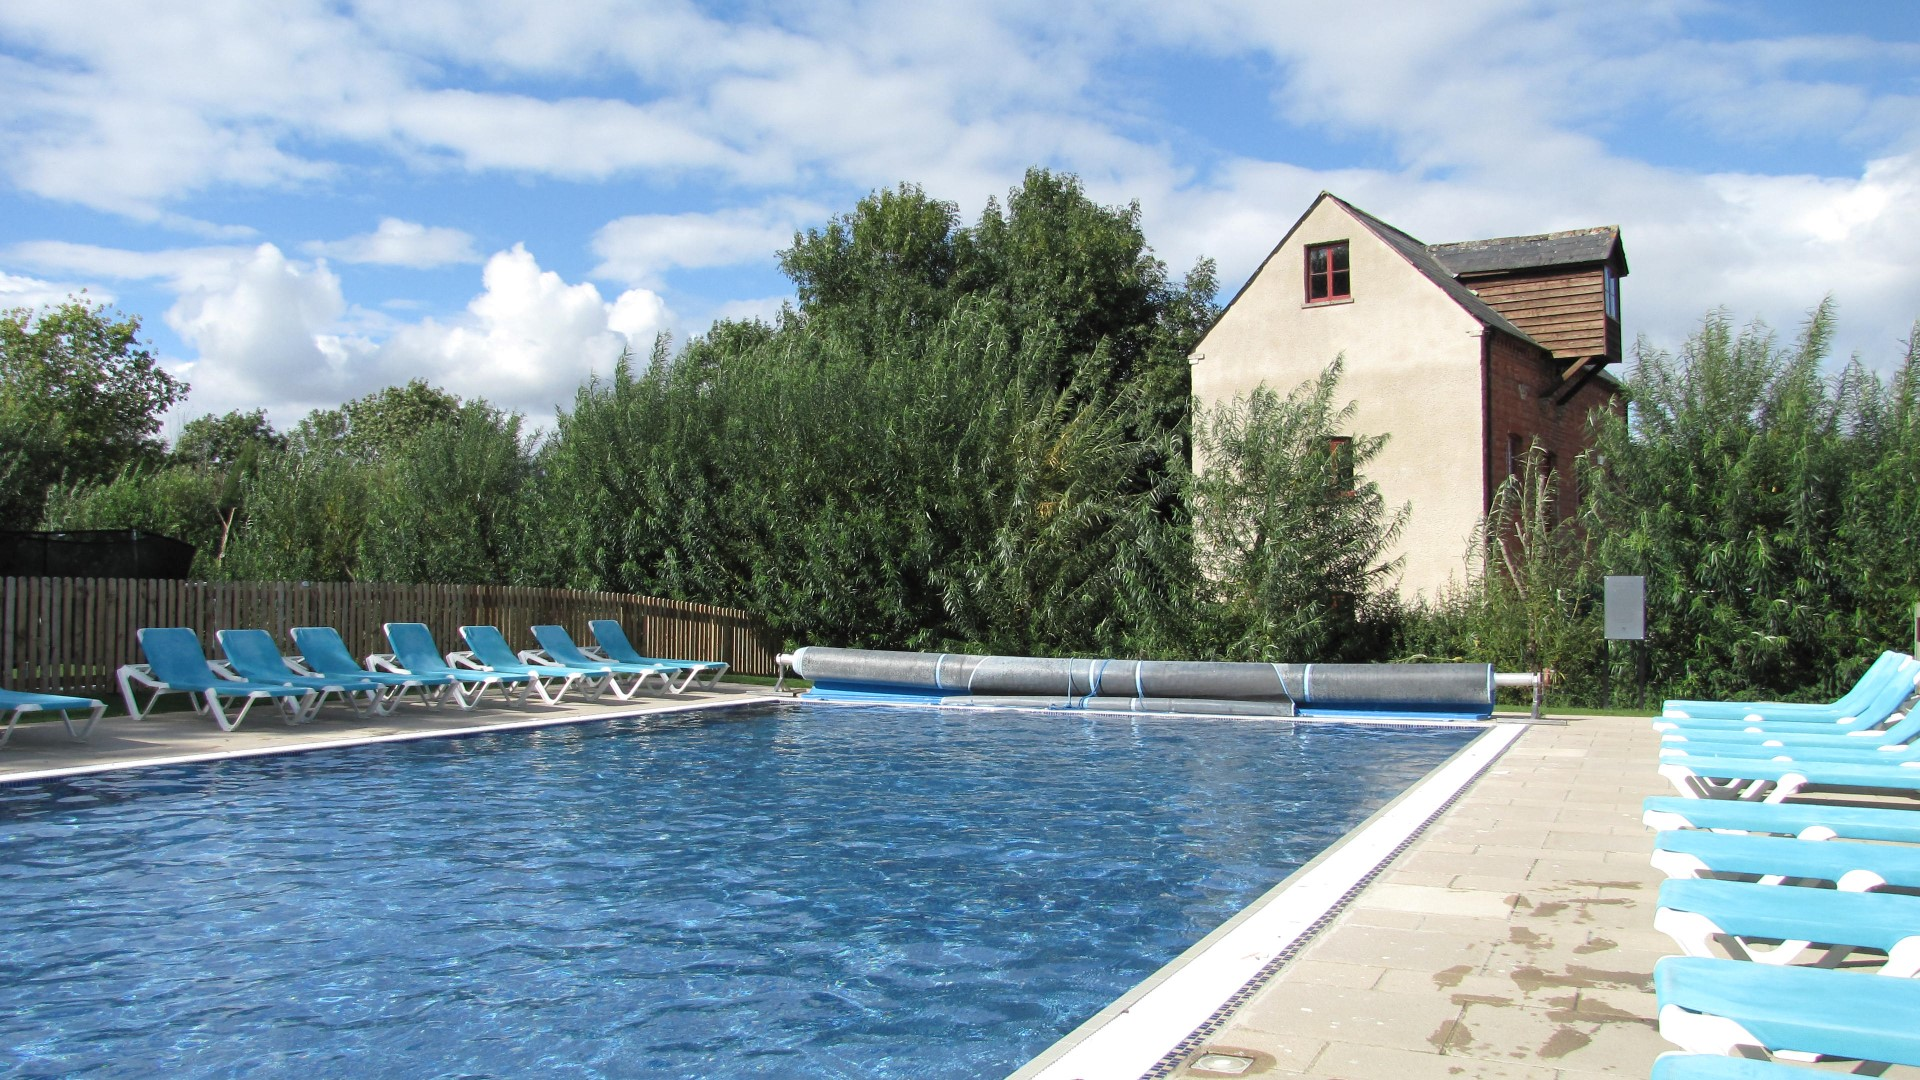 Mill Village pool